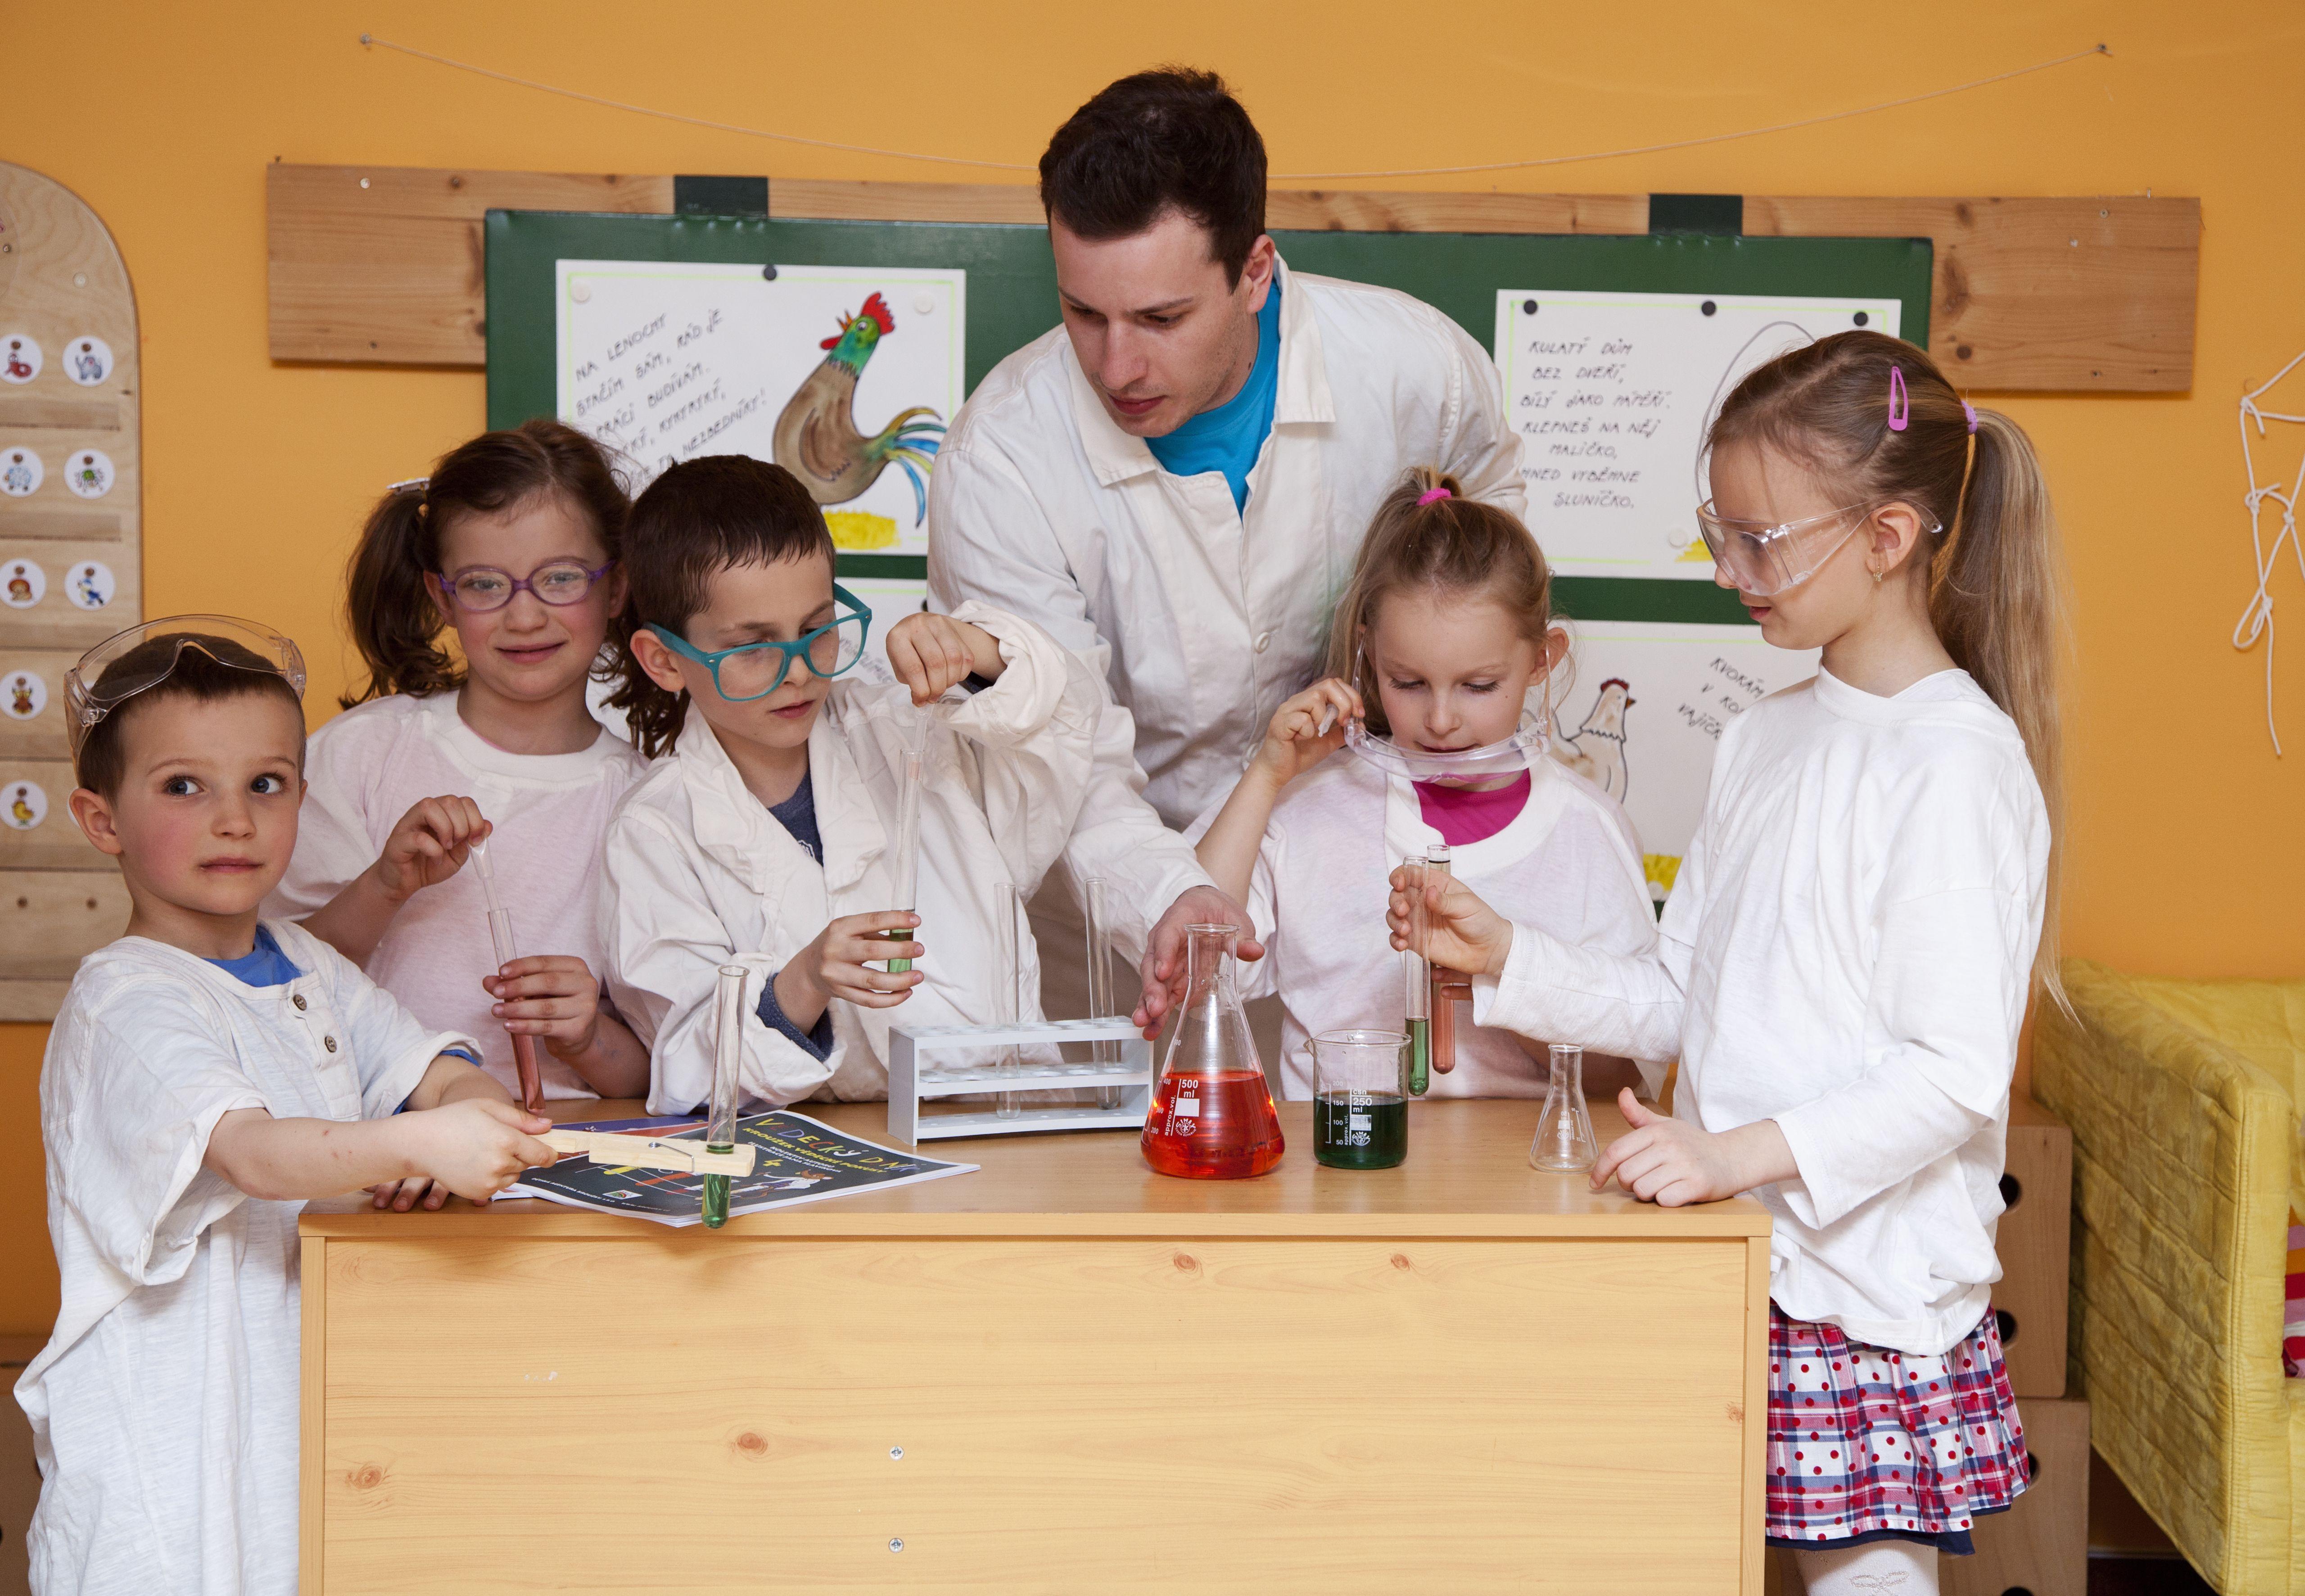 Vedecké pokusy